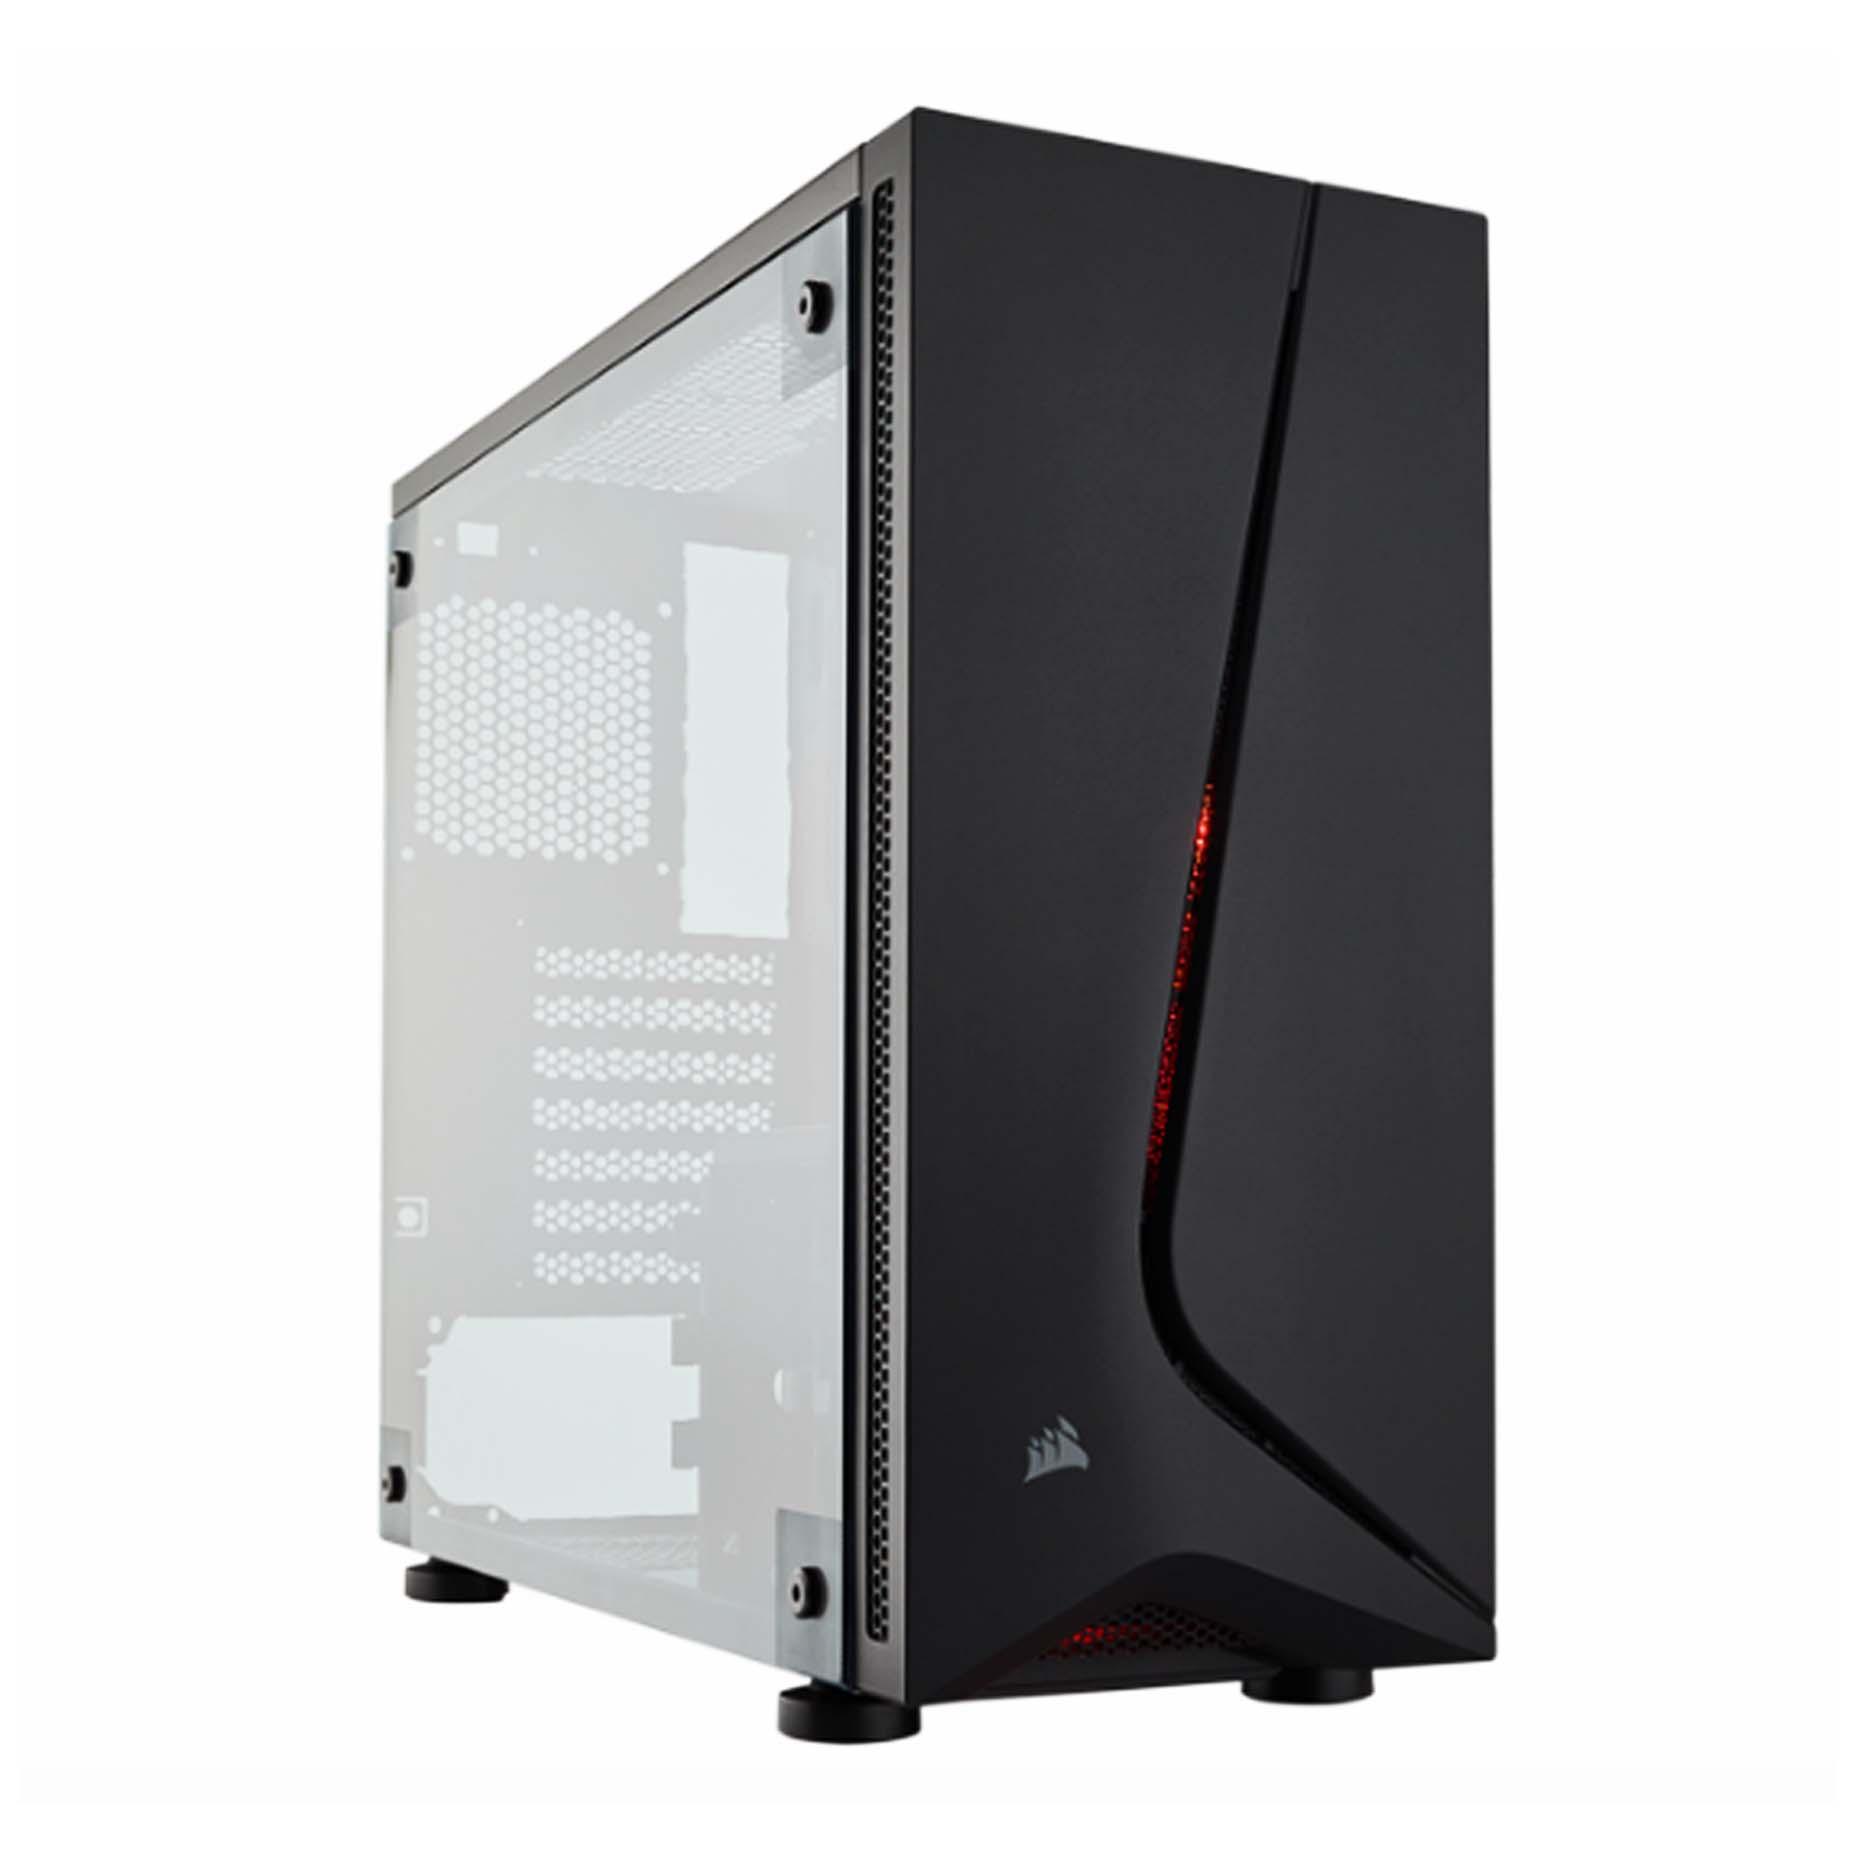 Harga Jual Corsair CC-9011138-WW Carbide Series SPEC-05 Mid-Tower Gaming Case-Black